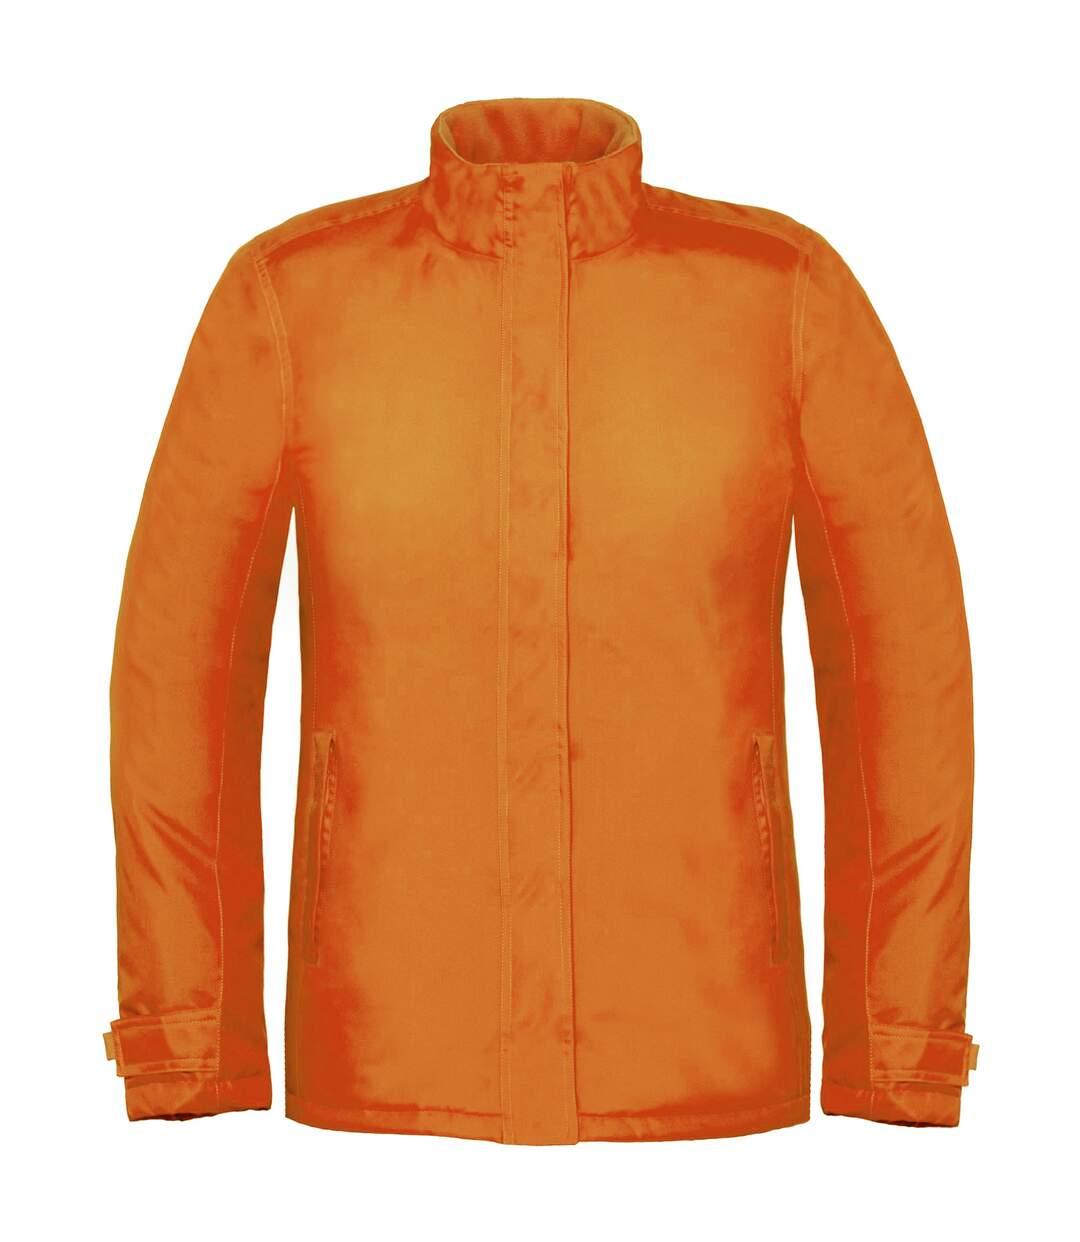 B&C Womens/Ladies Premium Real+ Windproof Waterproof Thermo-Isolated Jacket (Orange) - UTBC2003